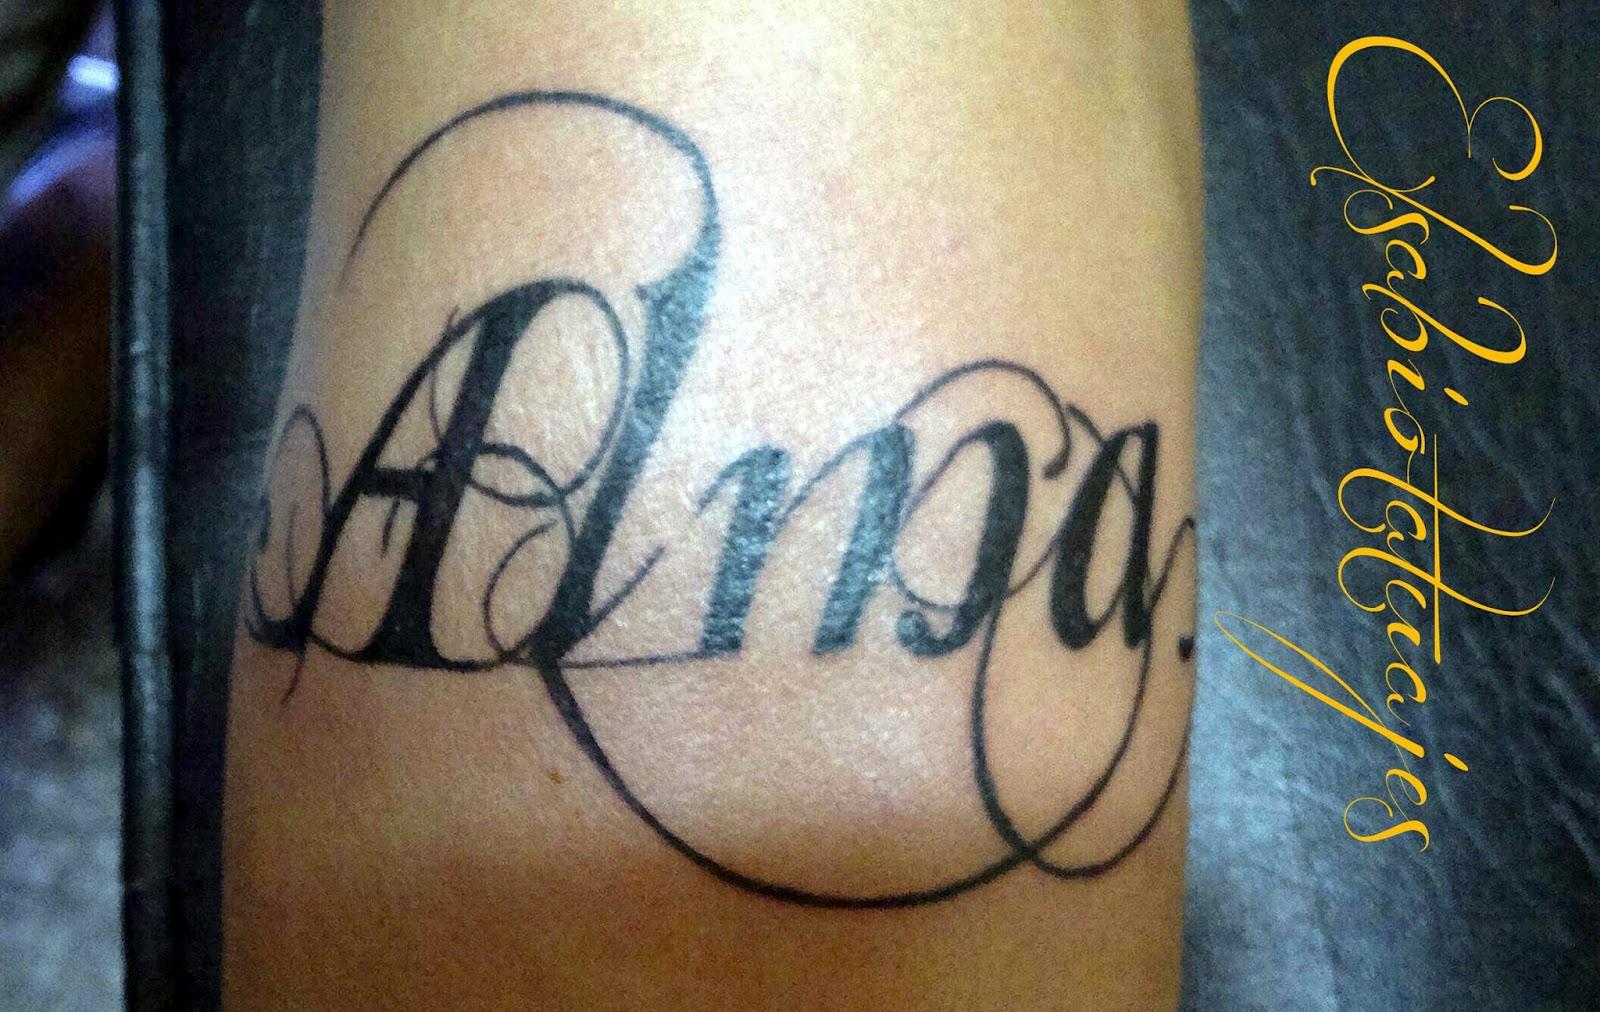 Tattoo santafe el sabio tatuajes tatuaje nombre alma - Tattoo chiffre ...